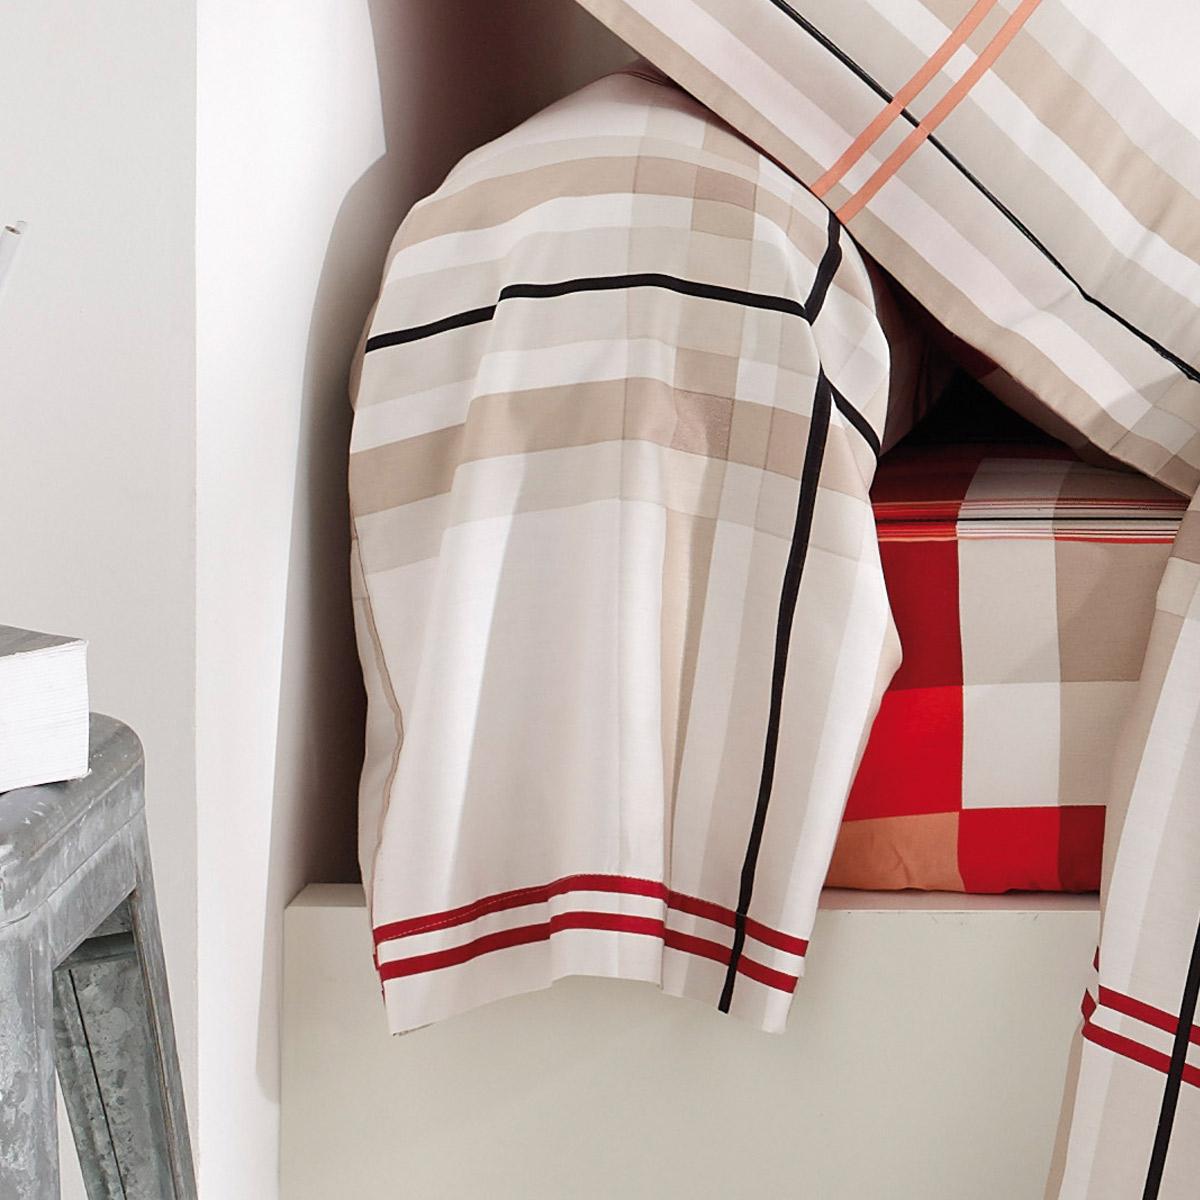 parure caroline soldes jusqu 39 55 linge de lit de qualit tradition des vosges. Black Bedroom Furniture Sets. Home Design Ideas